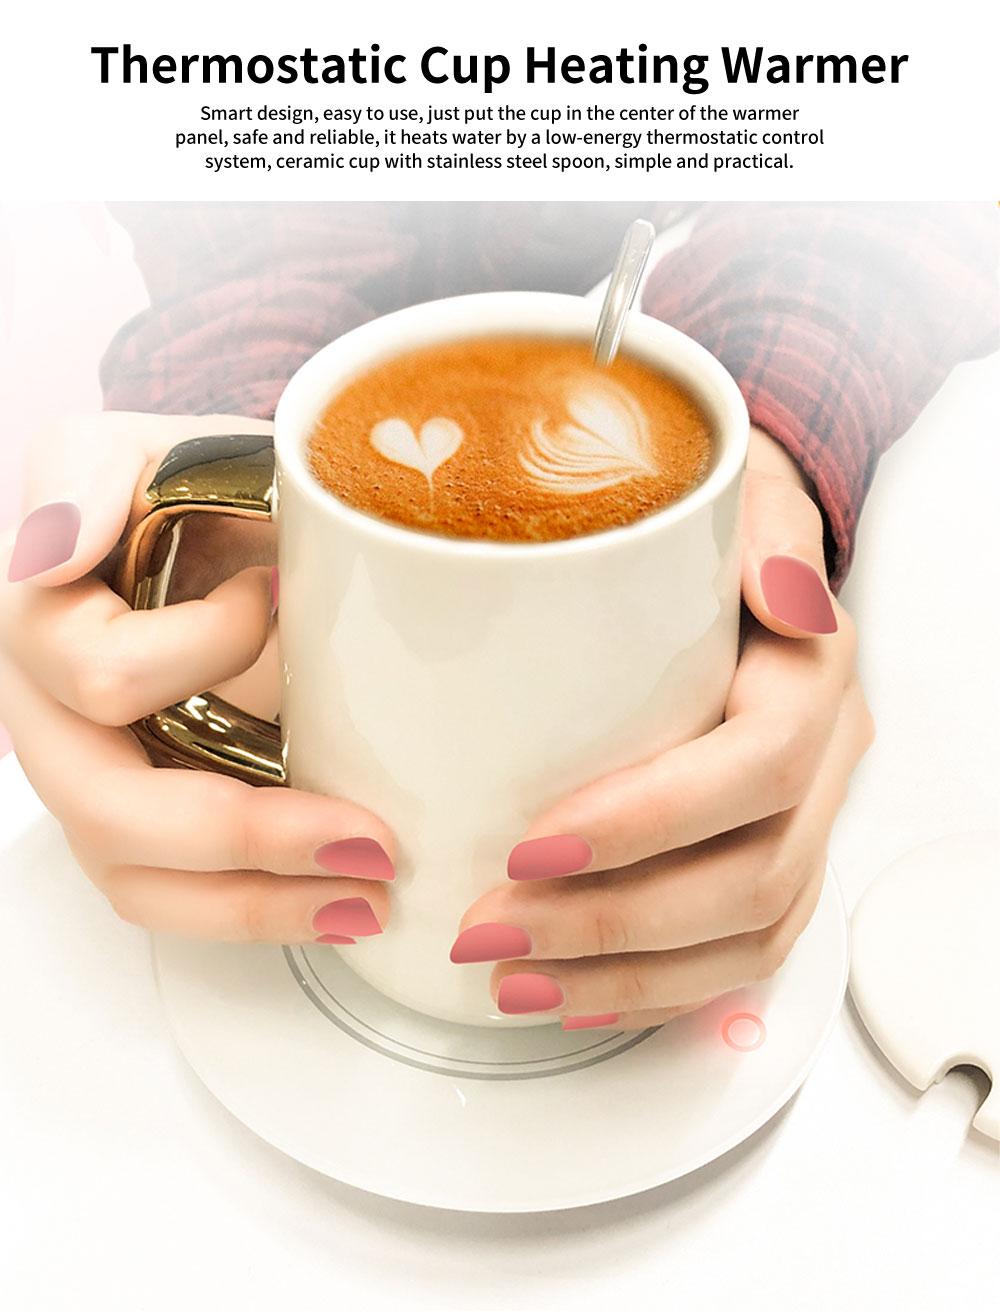 55 Degree Thermostatic Mug Heating Warmer for Hot Milk, Warm Tea, Warm Coffee, Warm Water 0